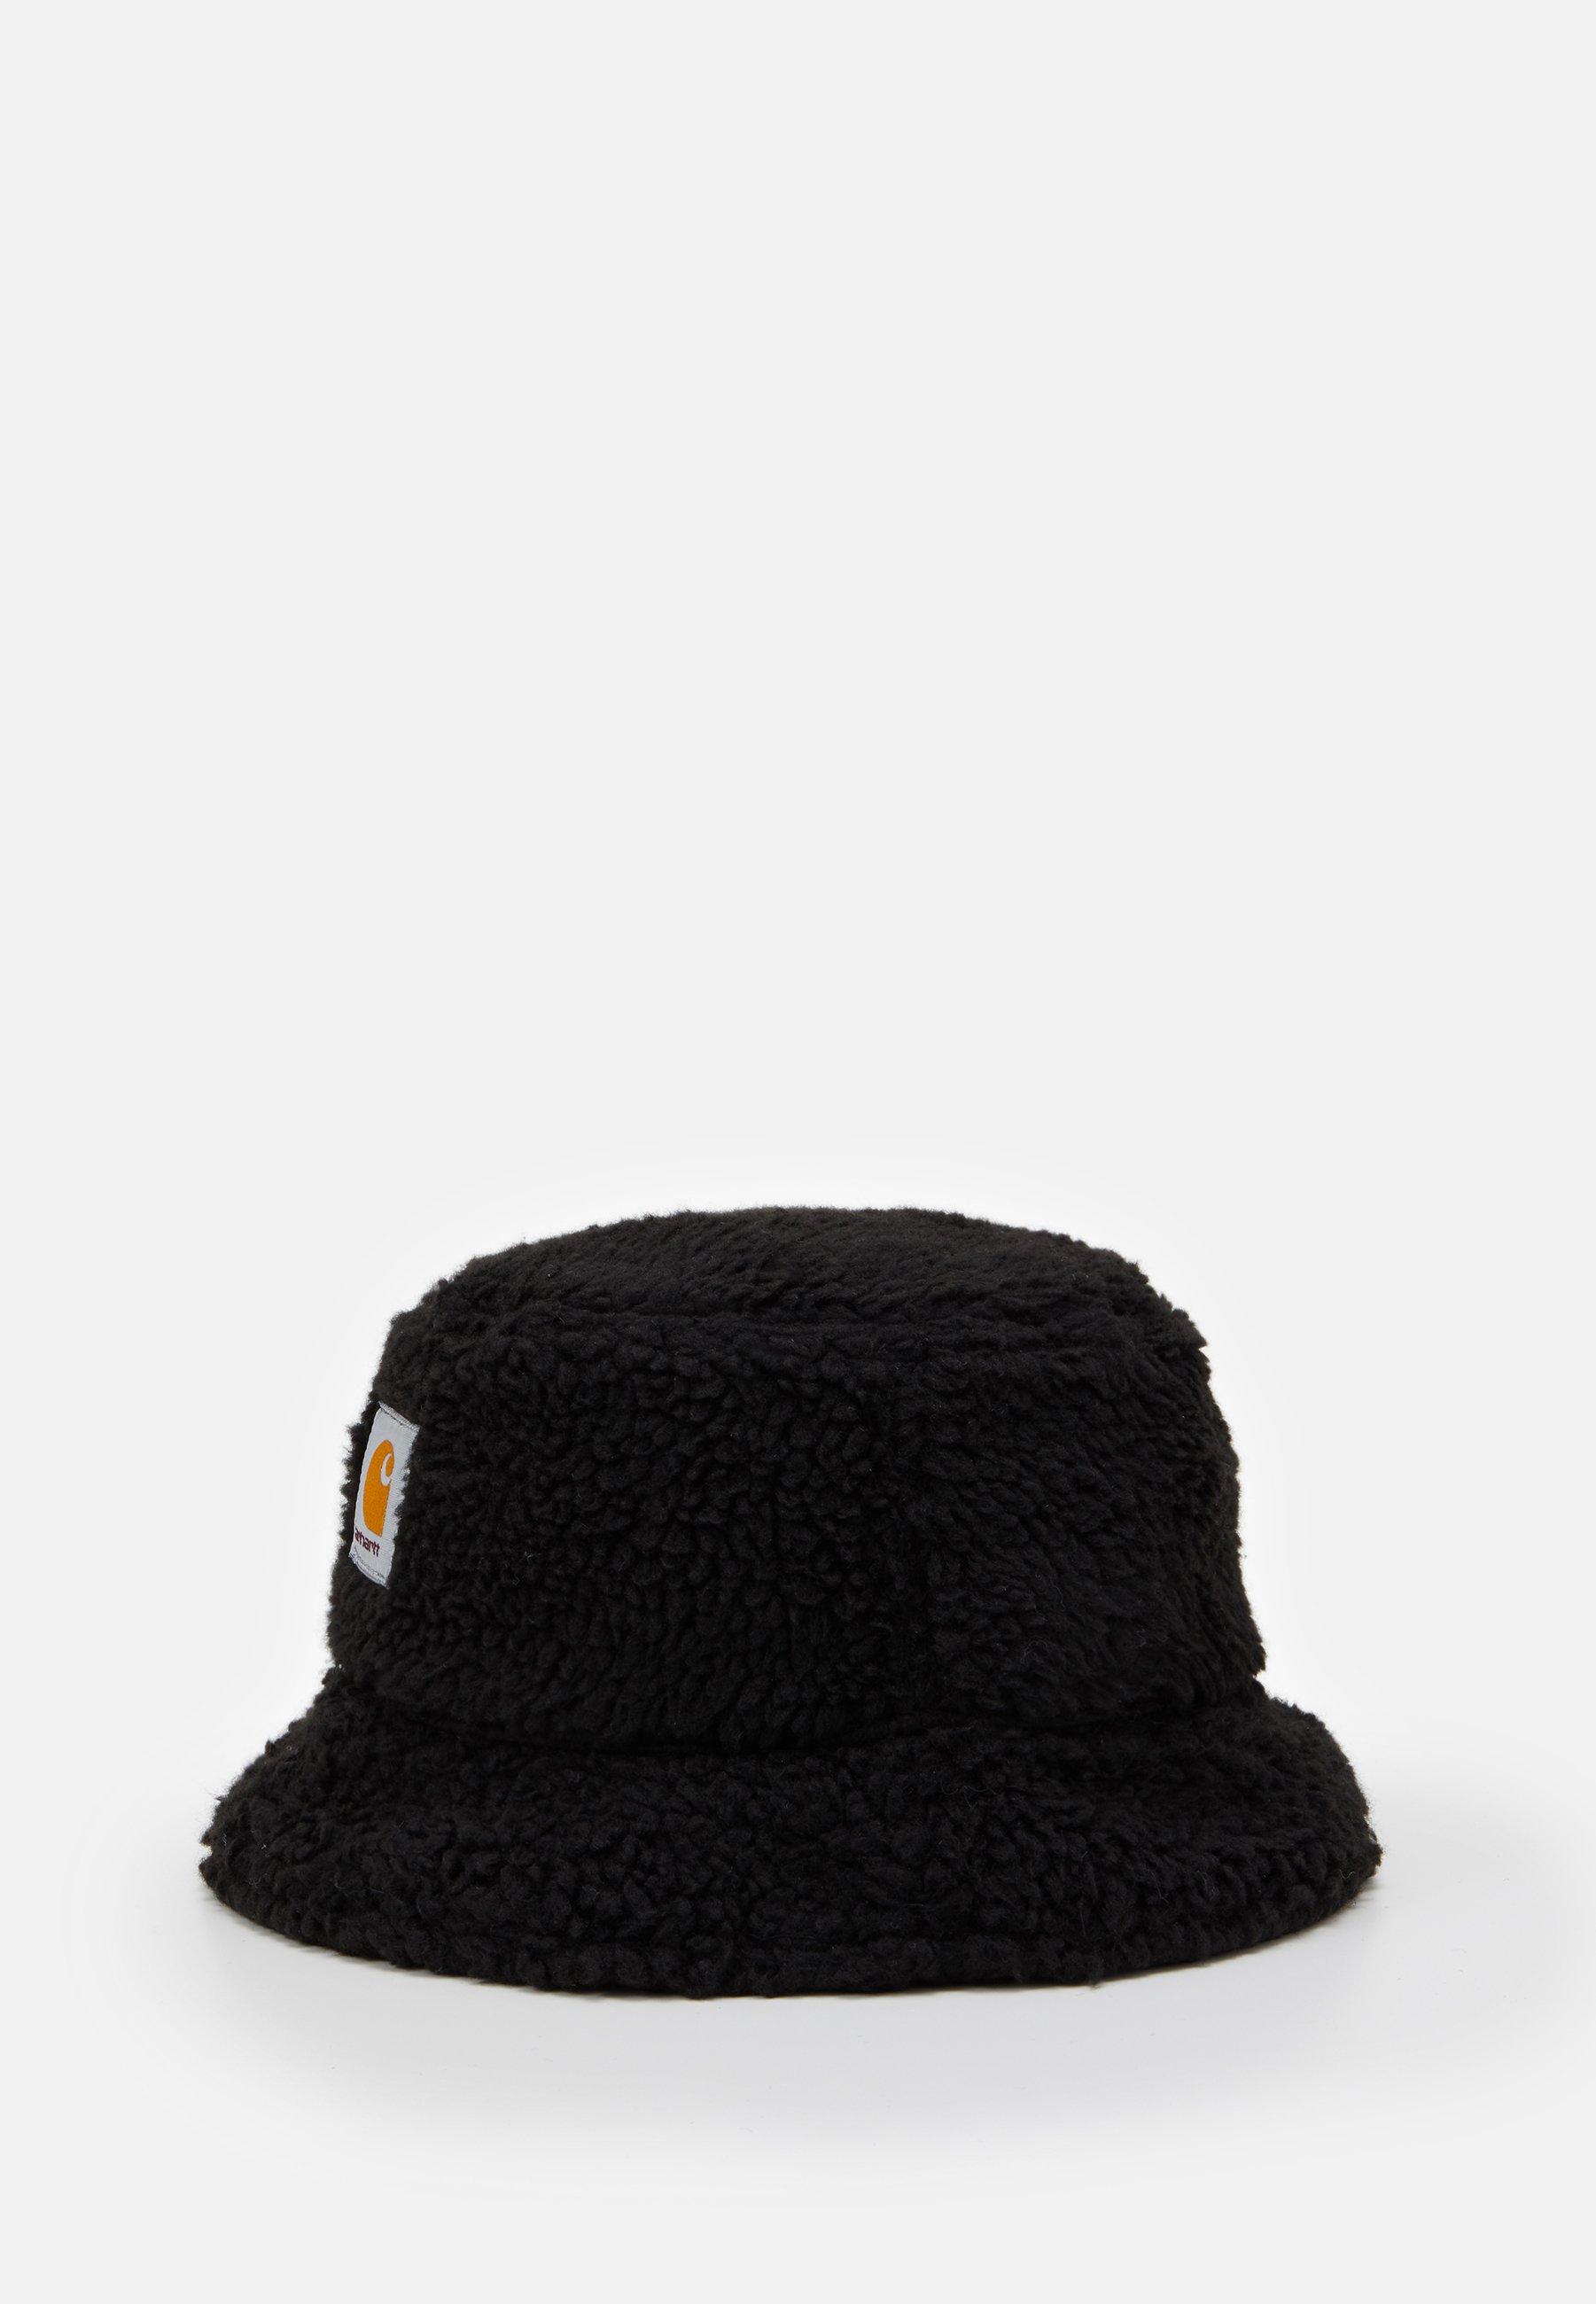 Carhartt WIP NORTHFIELD BUCKET HAT - Hatt - black/svart 7rZGfFPqYVlr6RE